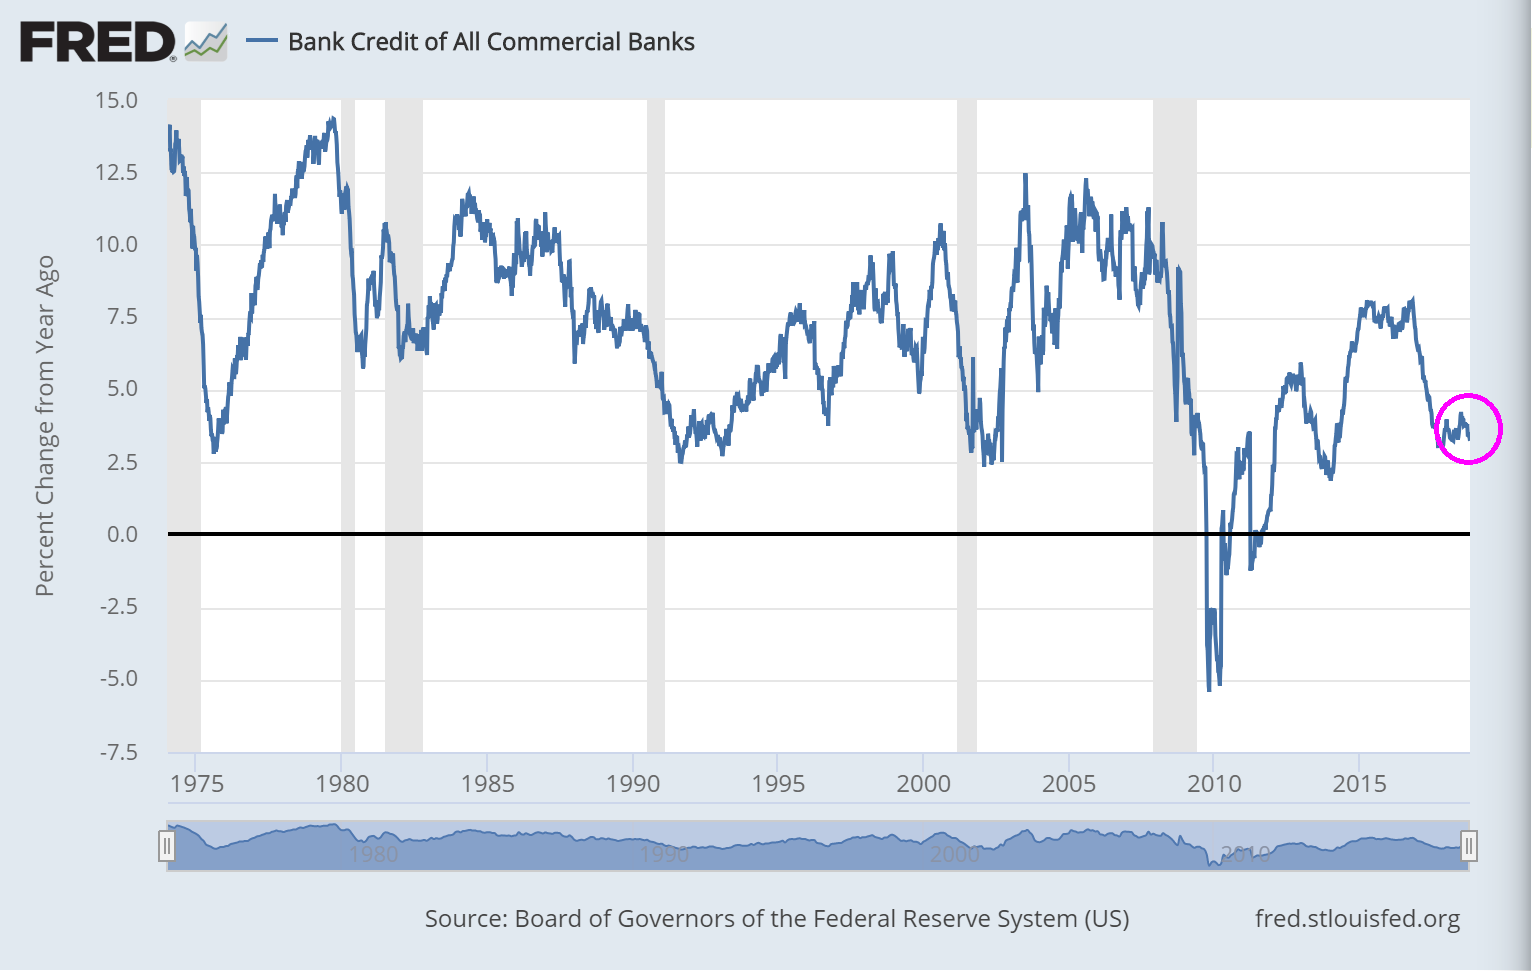 https://confoundedinterestnet.files.wordpress.com/2018/11/bankcreditslowdown.png